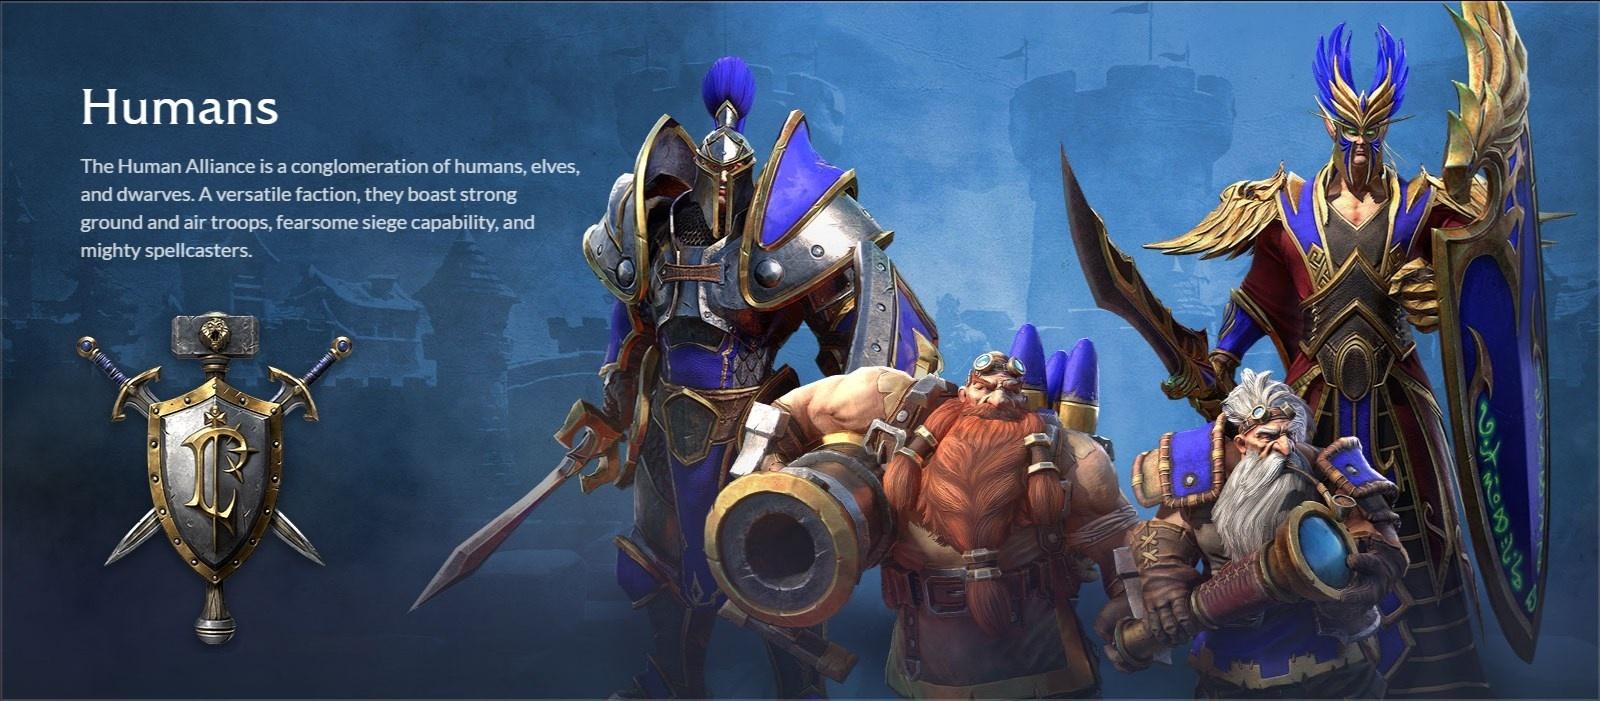 Warcraft 3: Reforged Обзор - Дата выхода, Модели, Кампания